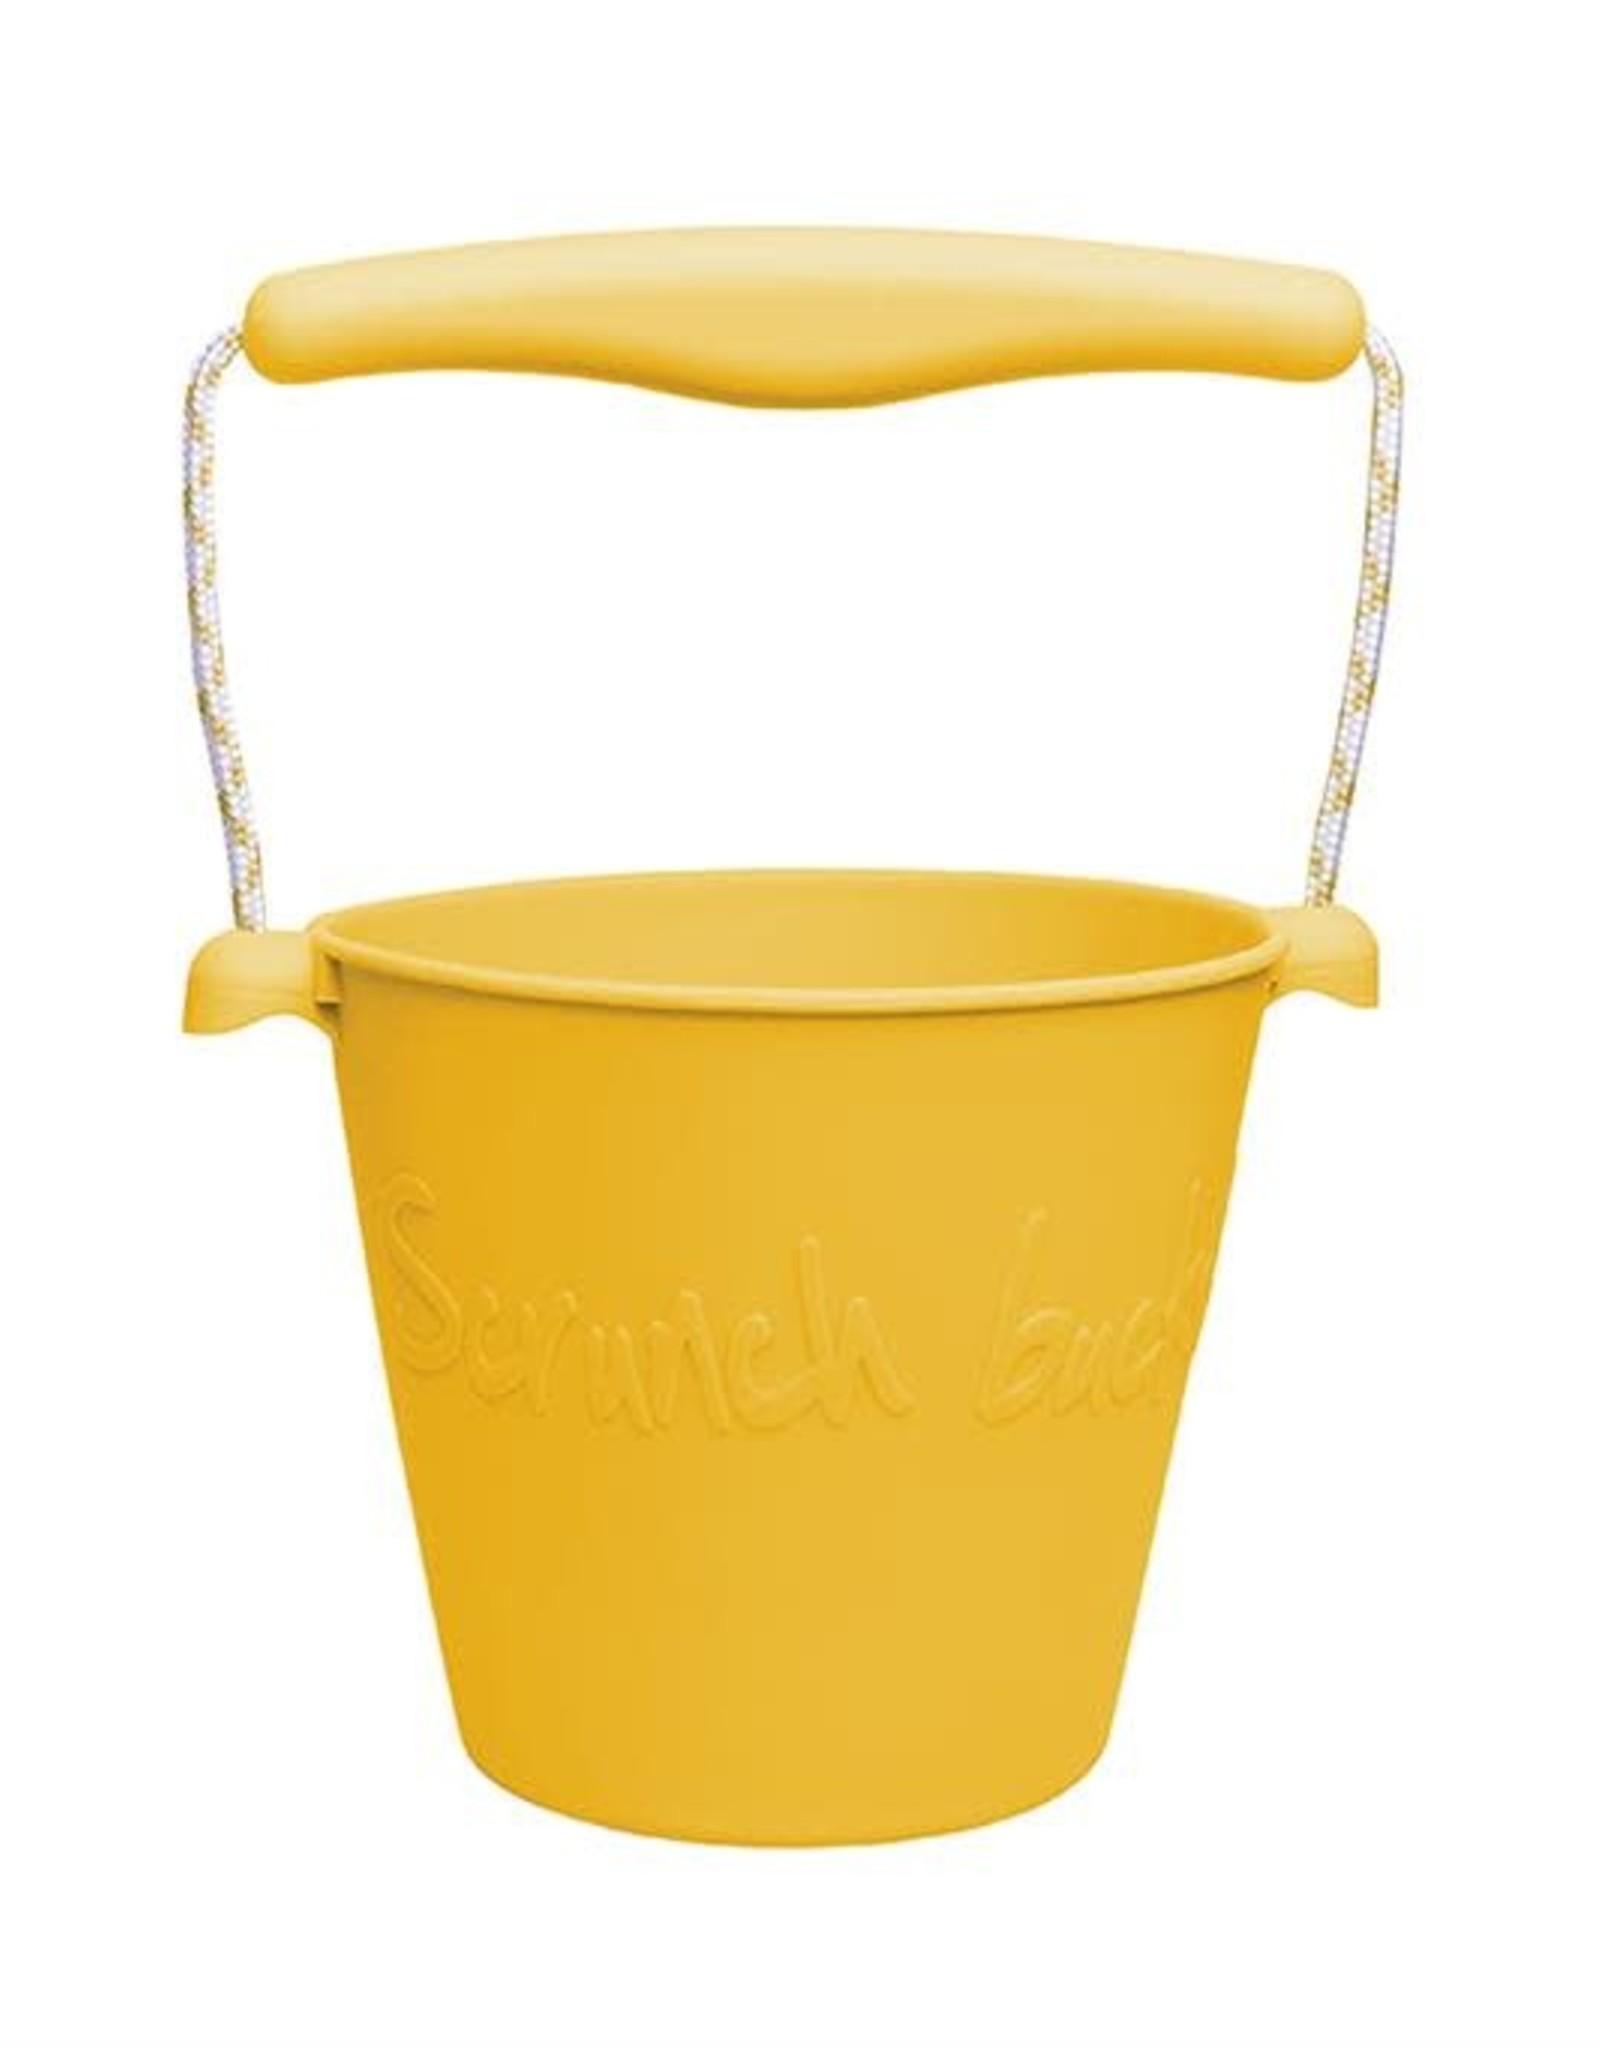 DAM Bucket Mustard